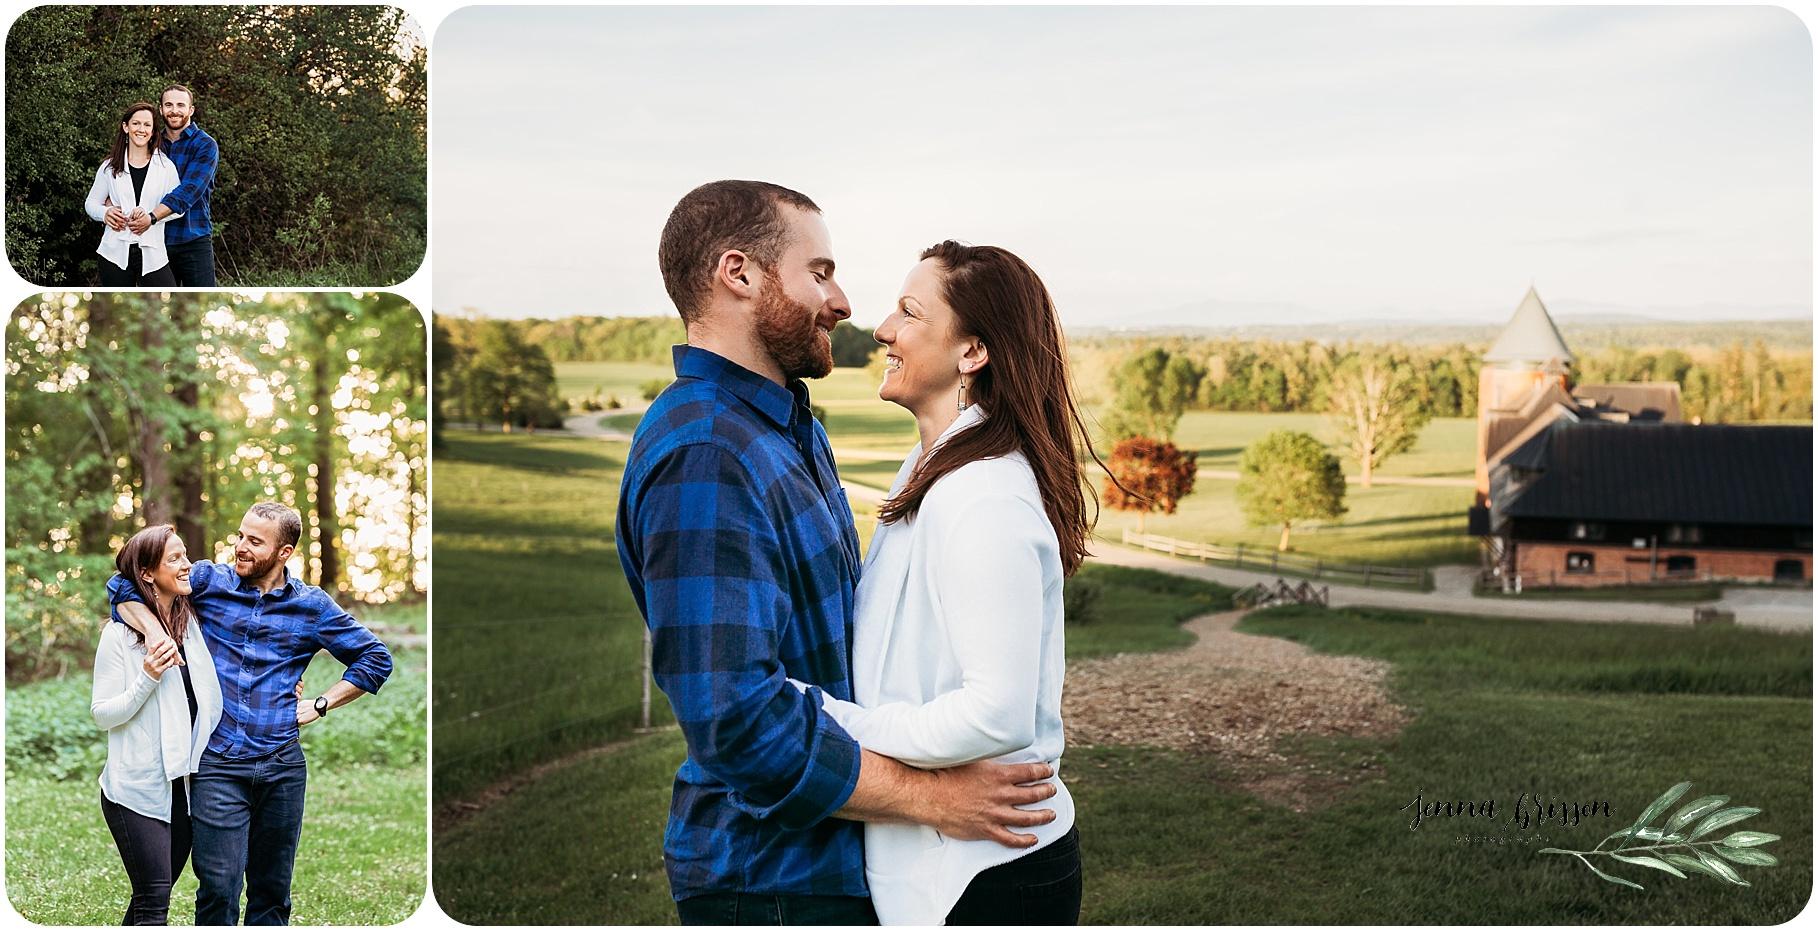 Shelburne Farms Engagement - Jenna Brisson Photography